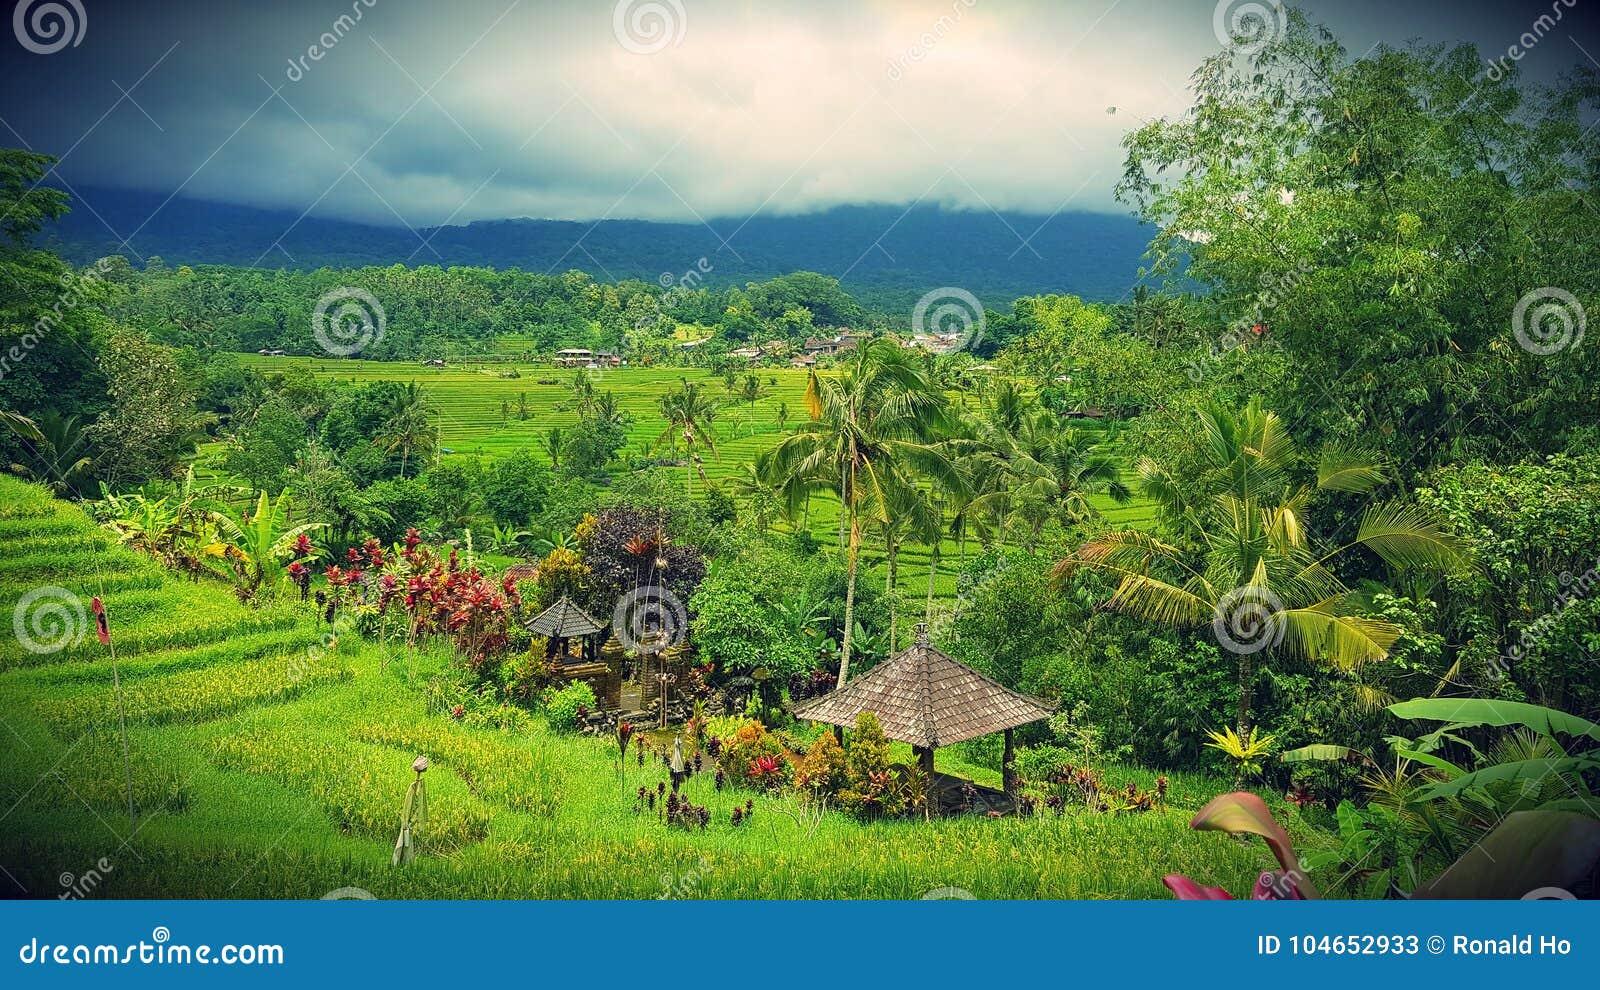 Bali pola ryżu